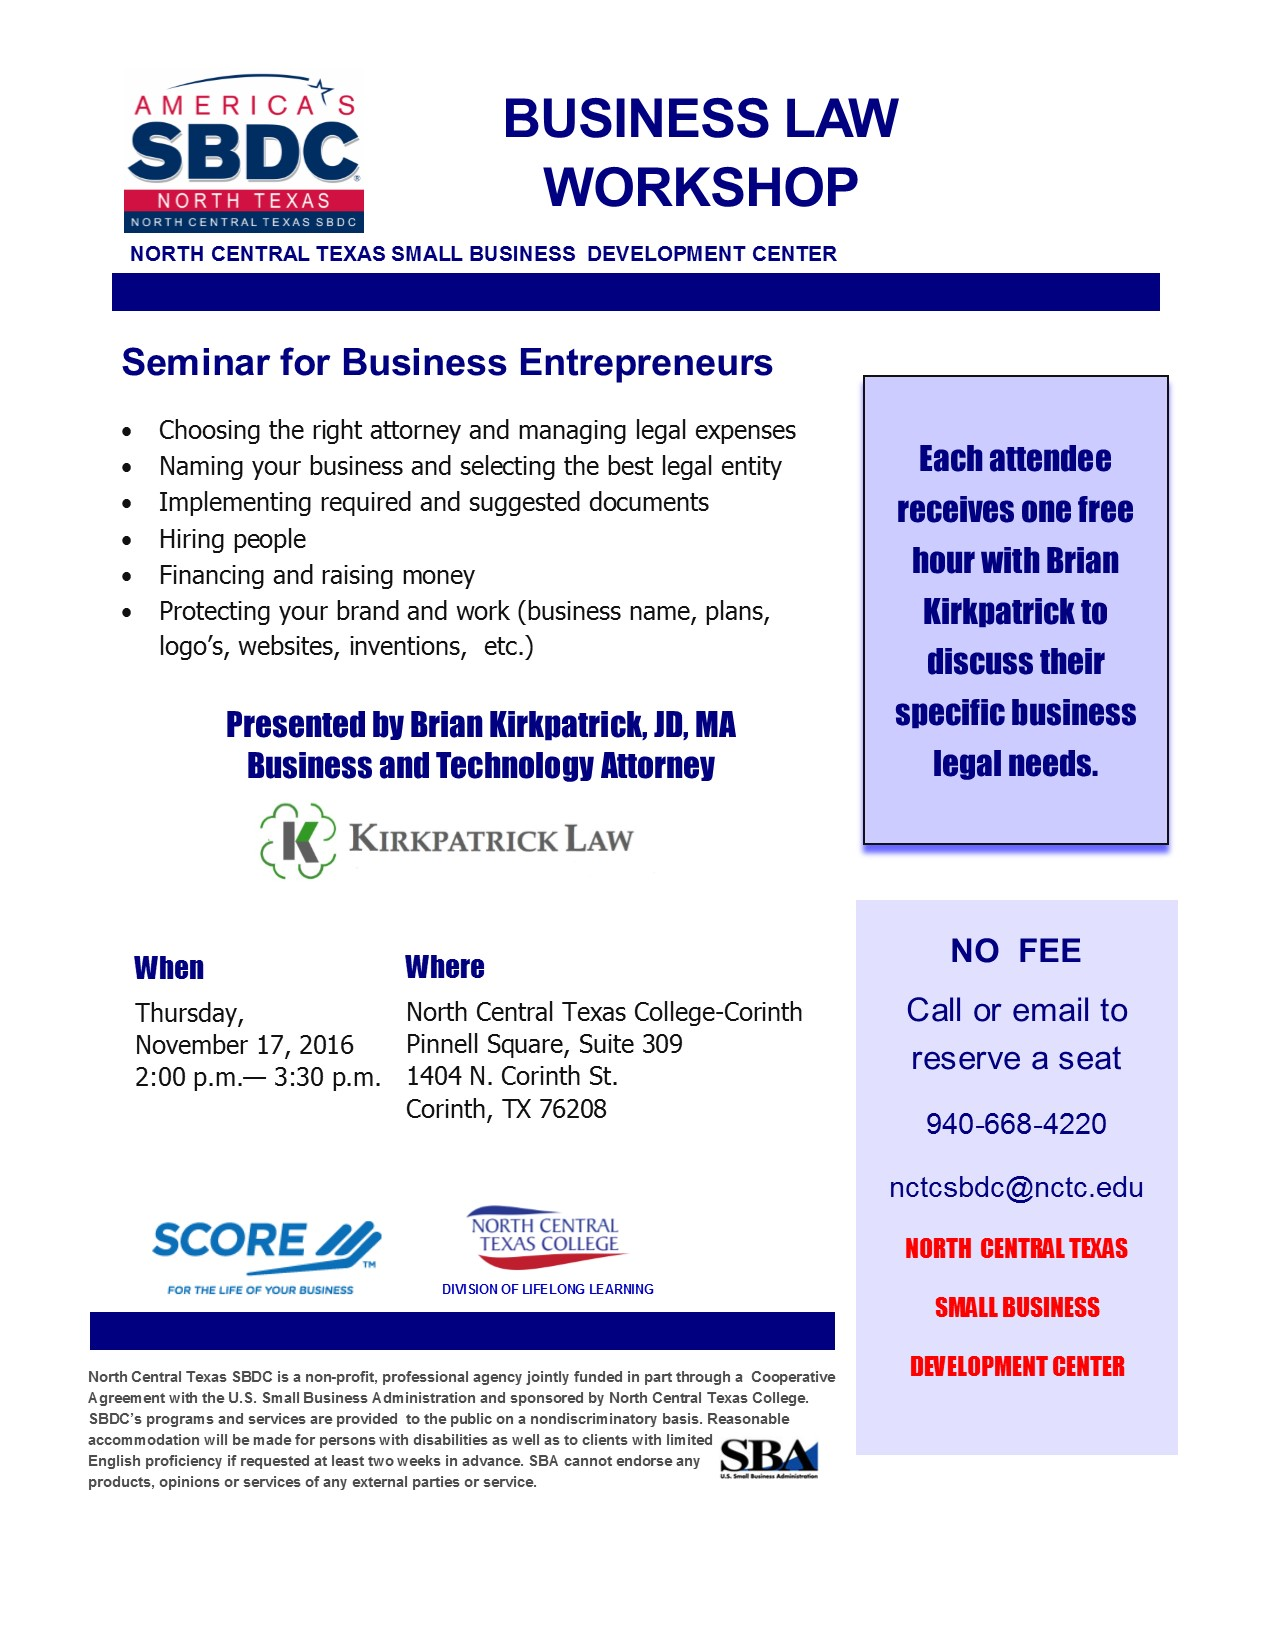 company law workshop Business law workshop - adam badawi (wash u) 2/22 monday, february 22, 2016 @ 4:00pm michael j marks professor of law, mark claster mamolen research scholar.